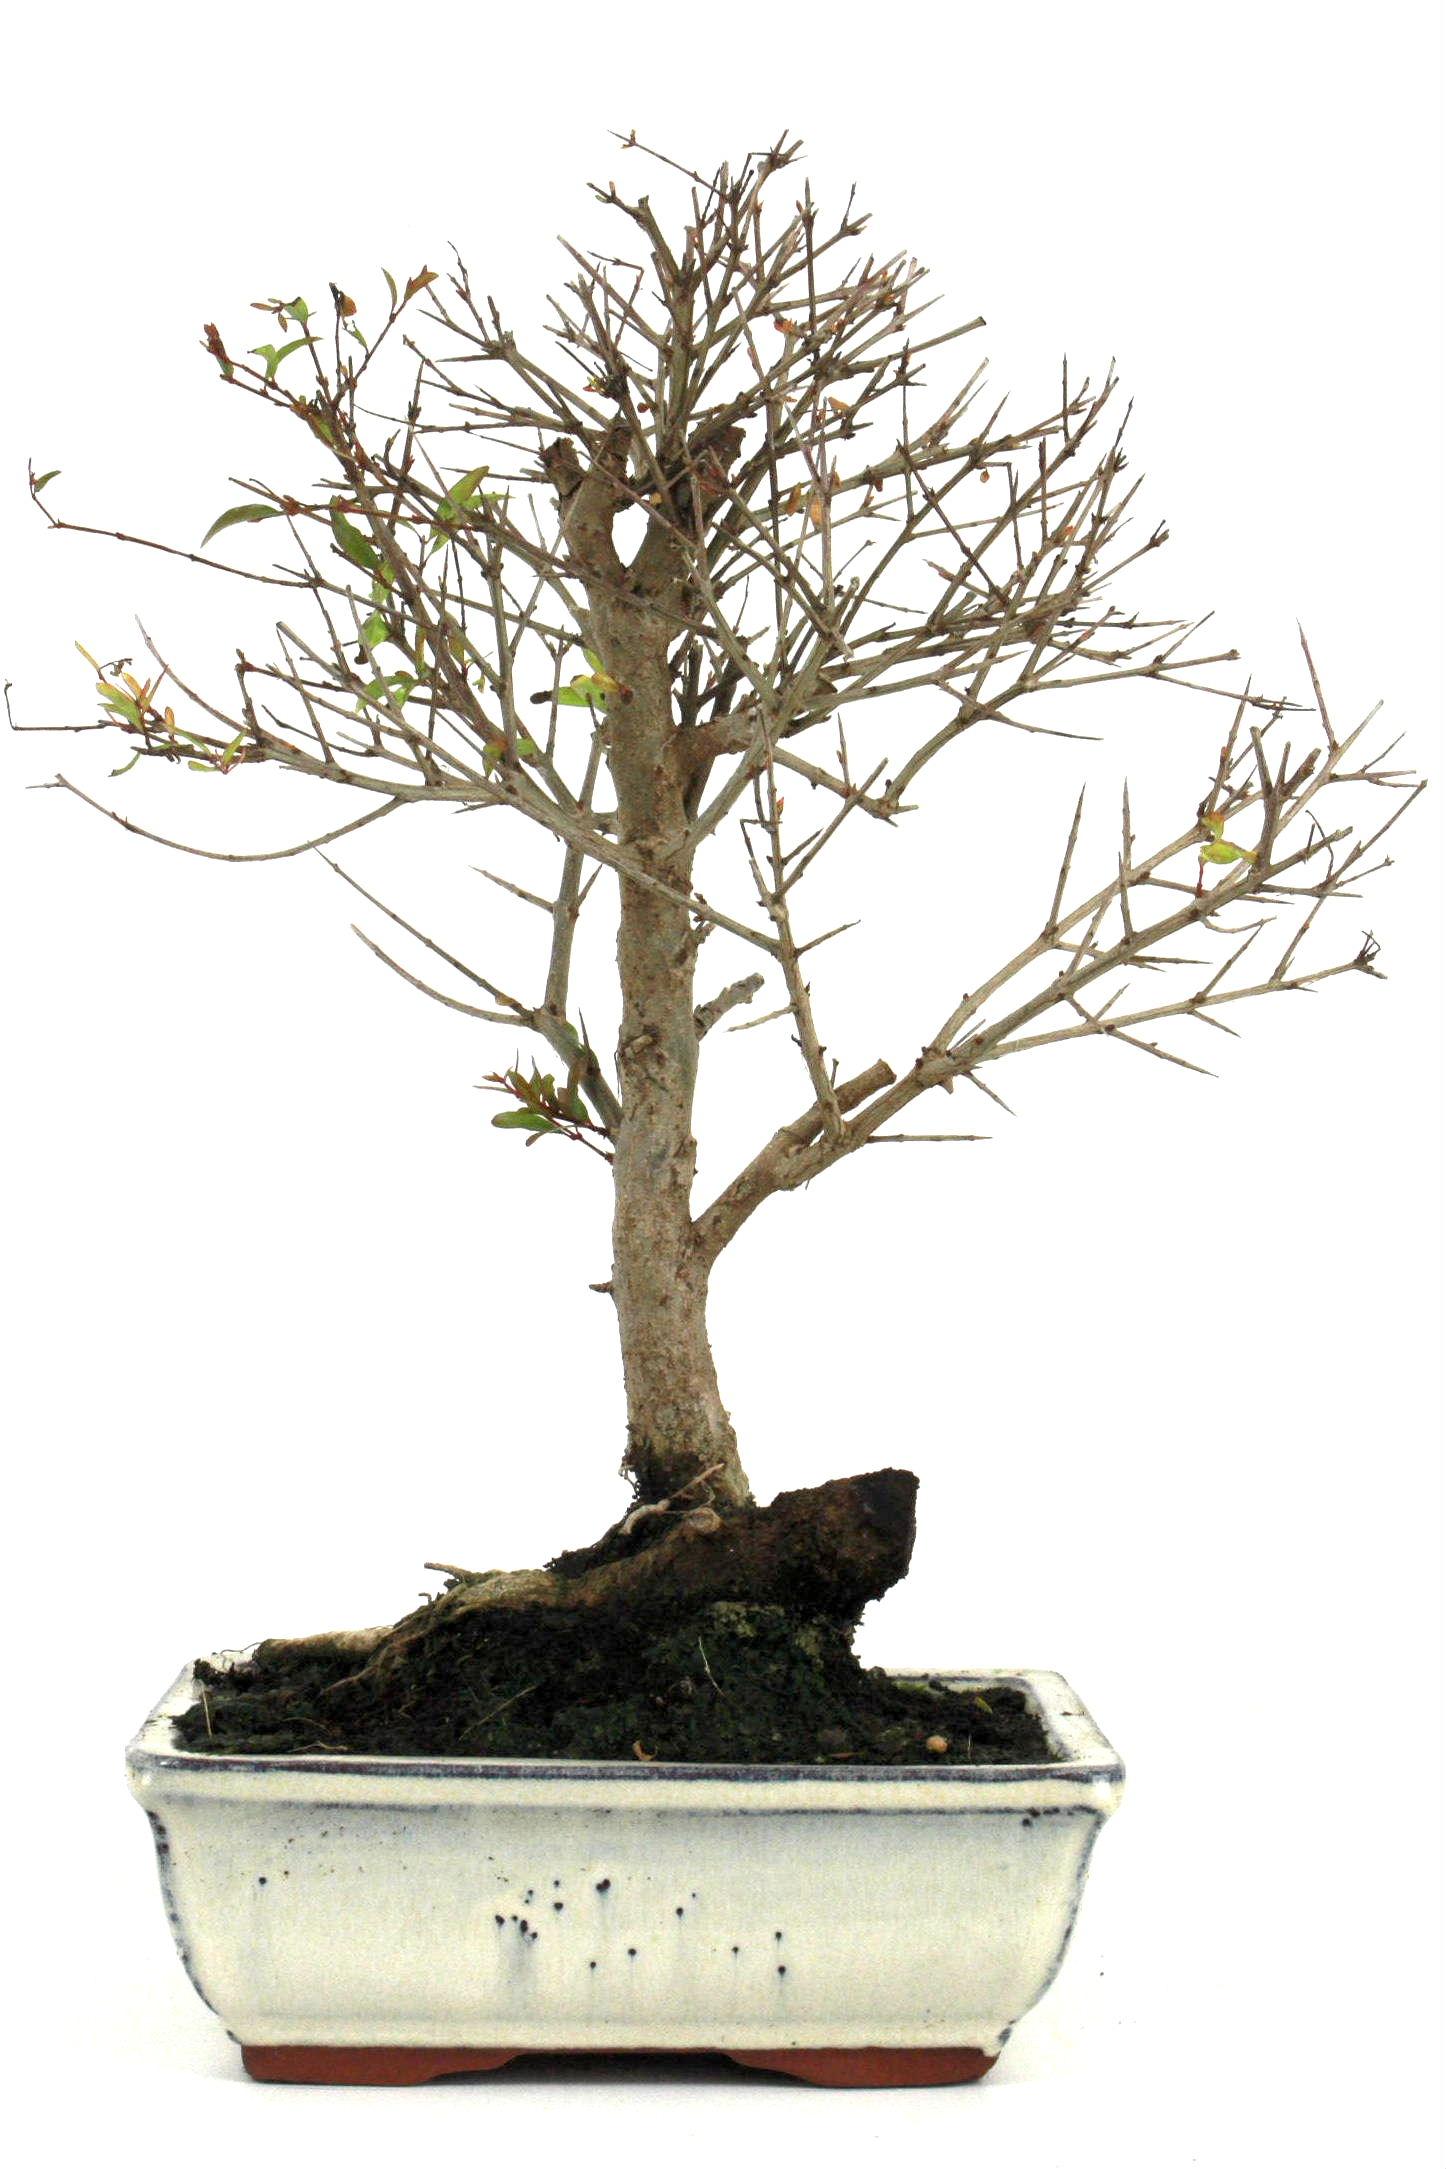 bonsai granatapfel 35 40 cm 1910 bei oyaki bonsai kaufen. Black Bedroom Furniture Sets. Home Design Ideas